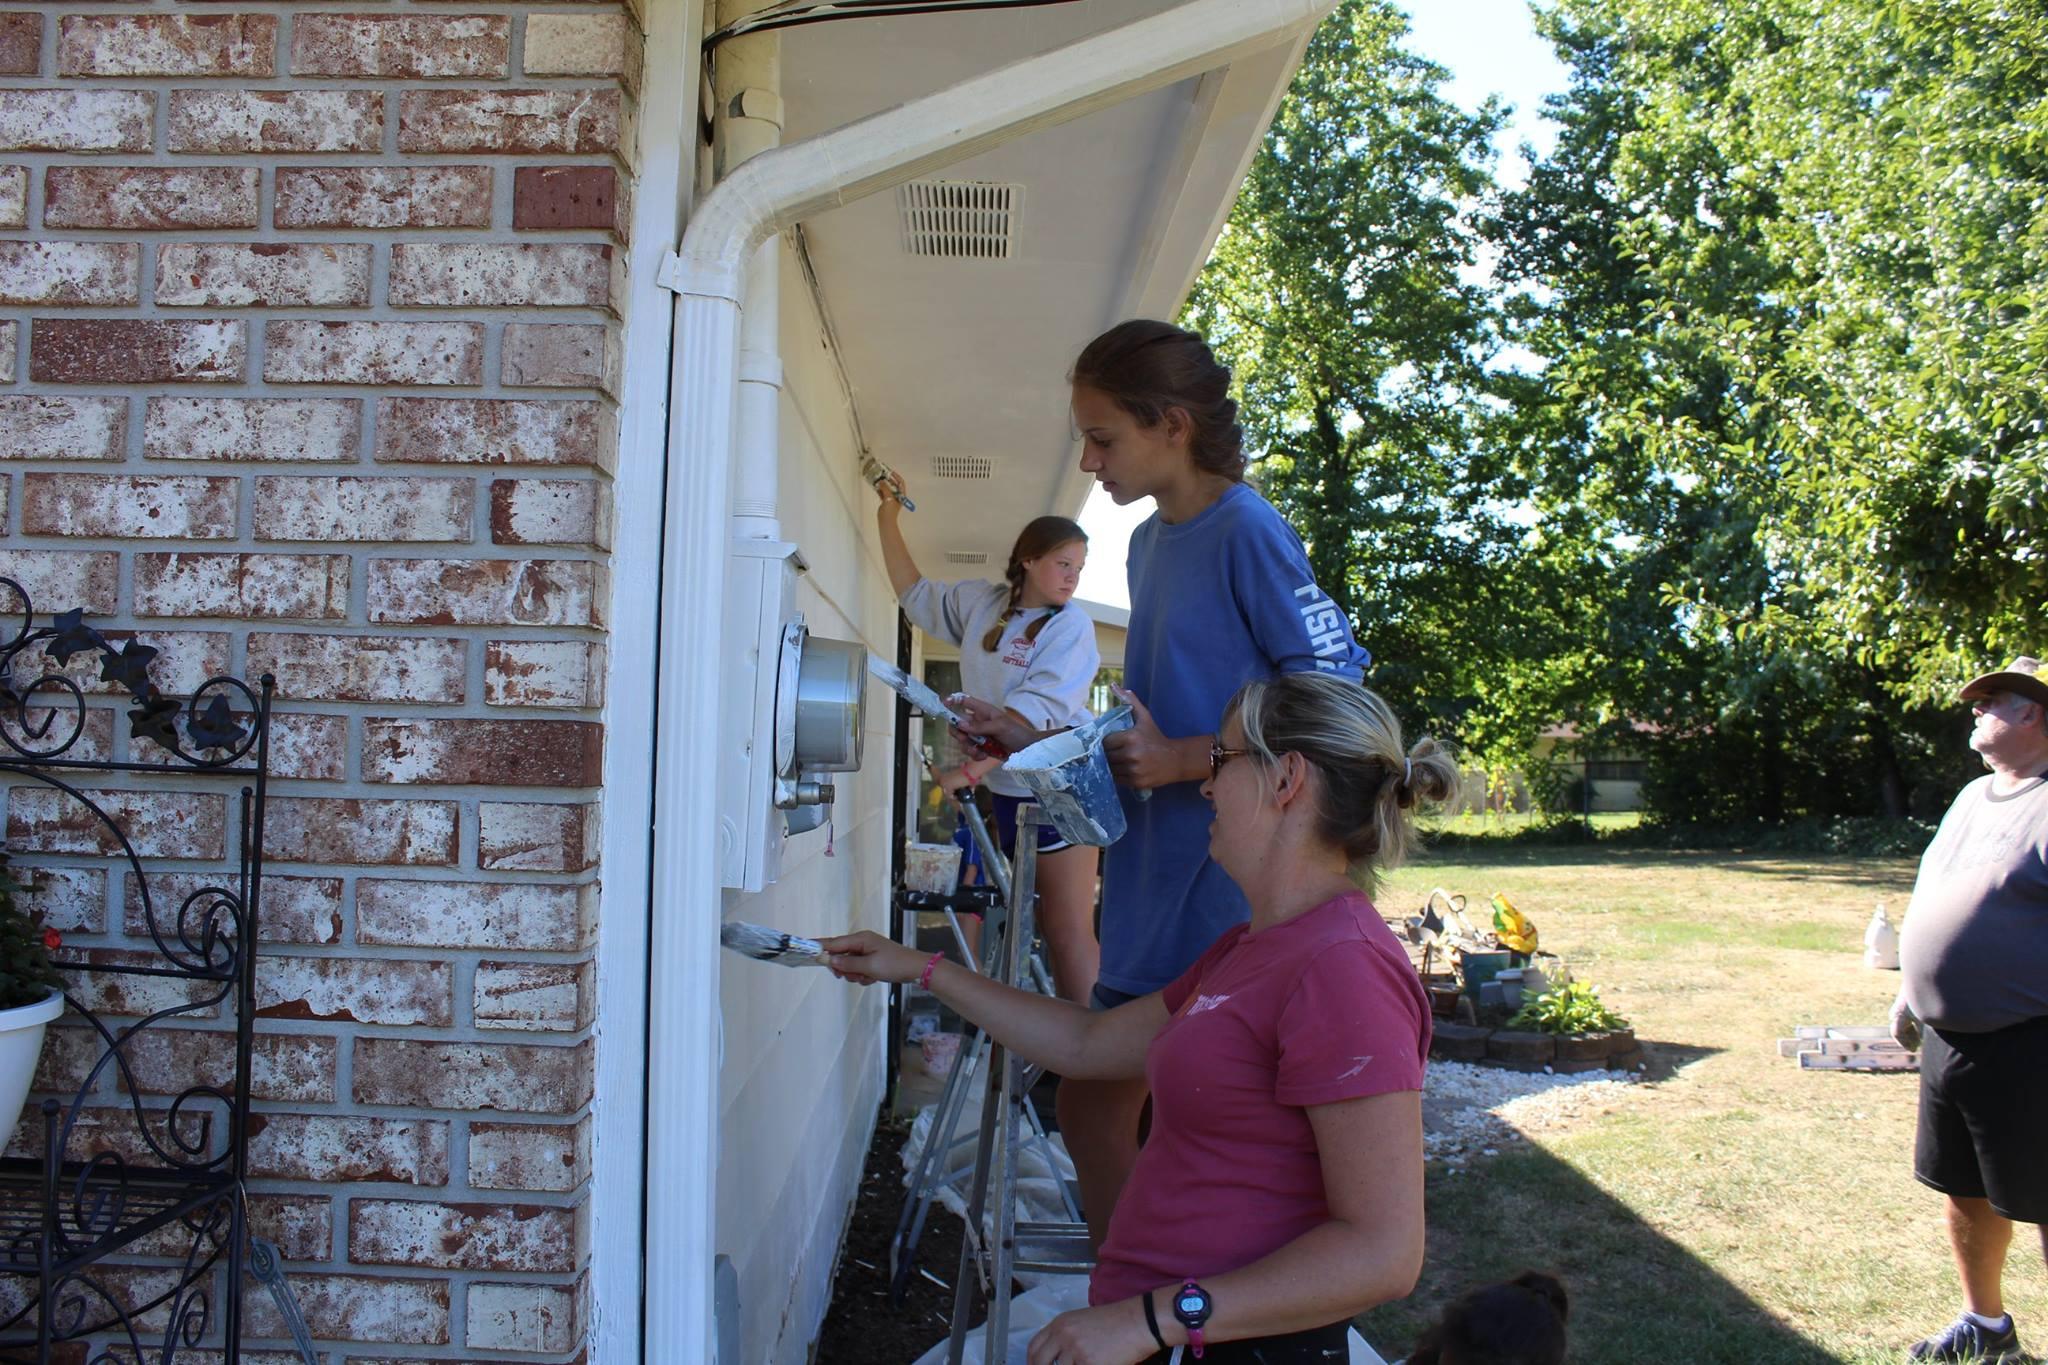 Chattanooga2016_06.30.16_WH.jpg